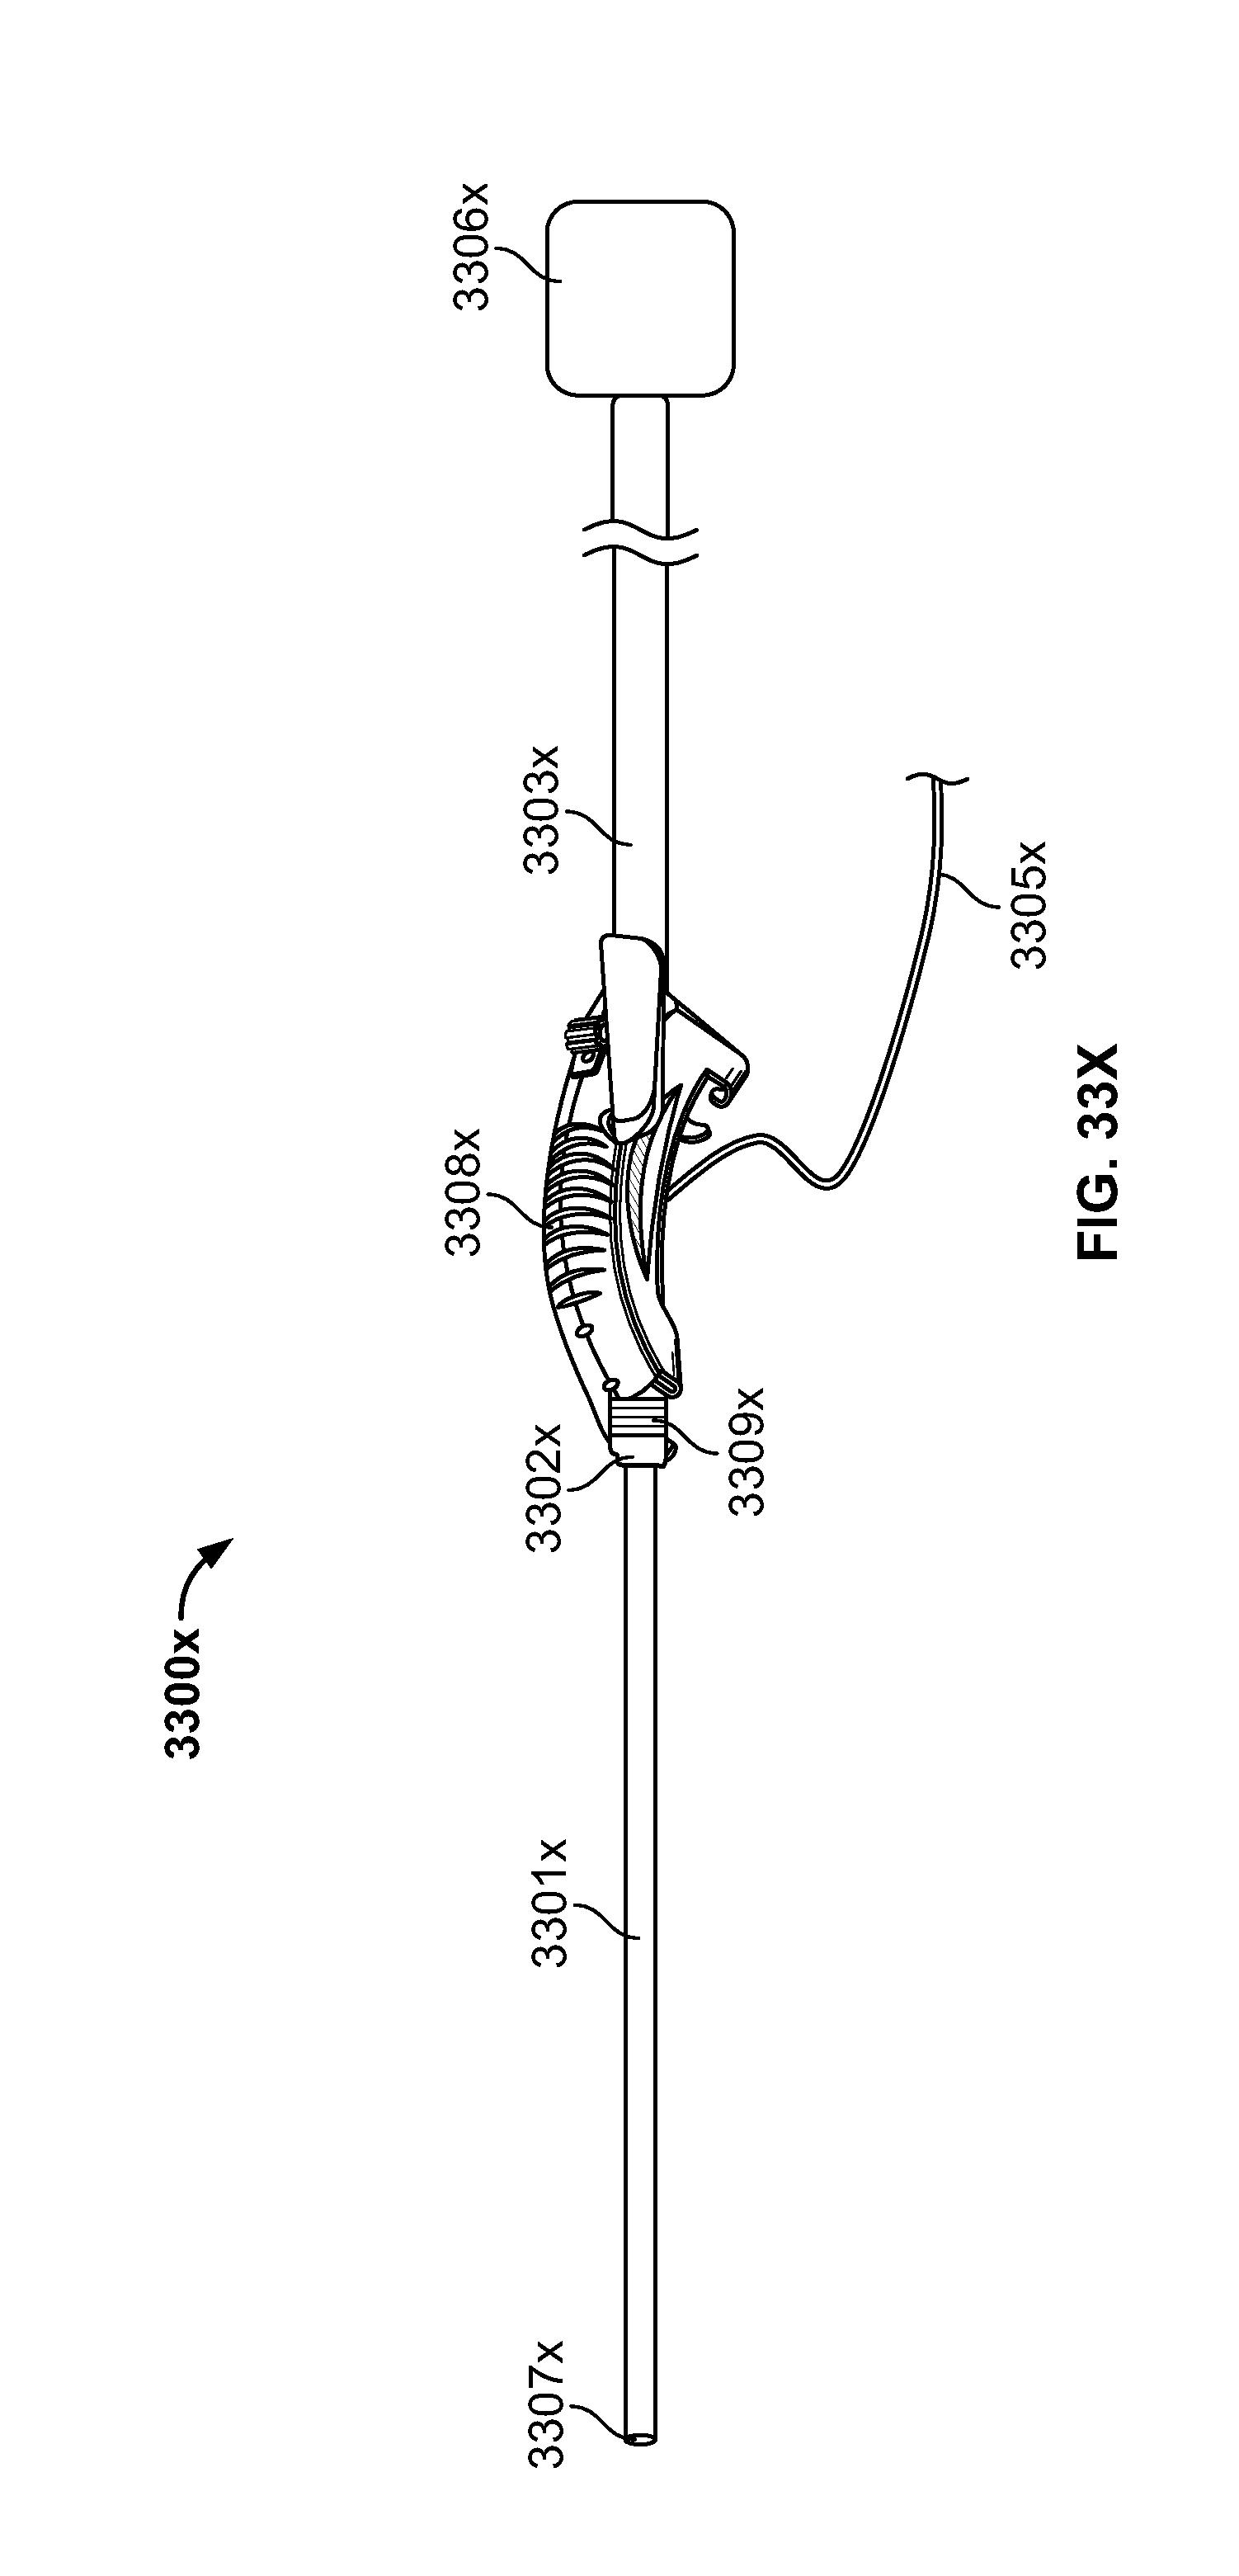 Patent US 10,064,697 B2